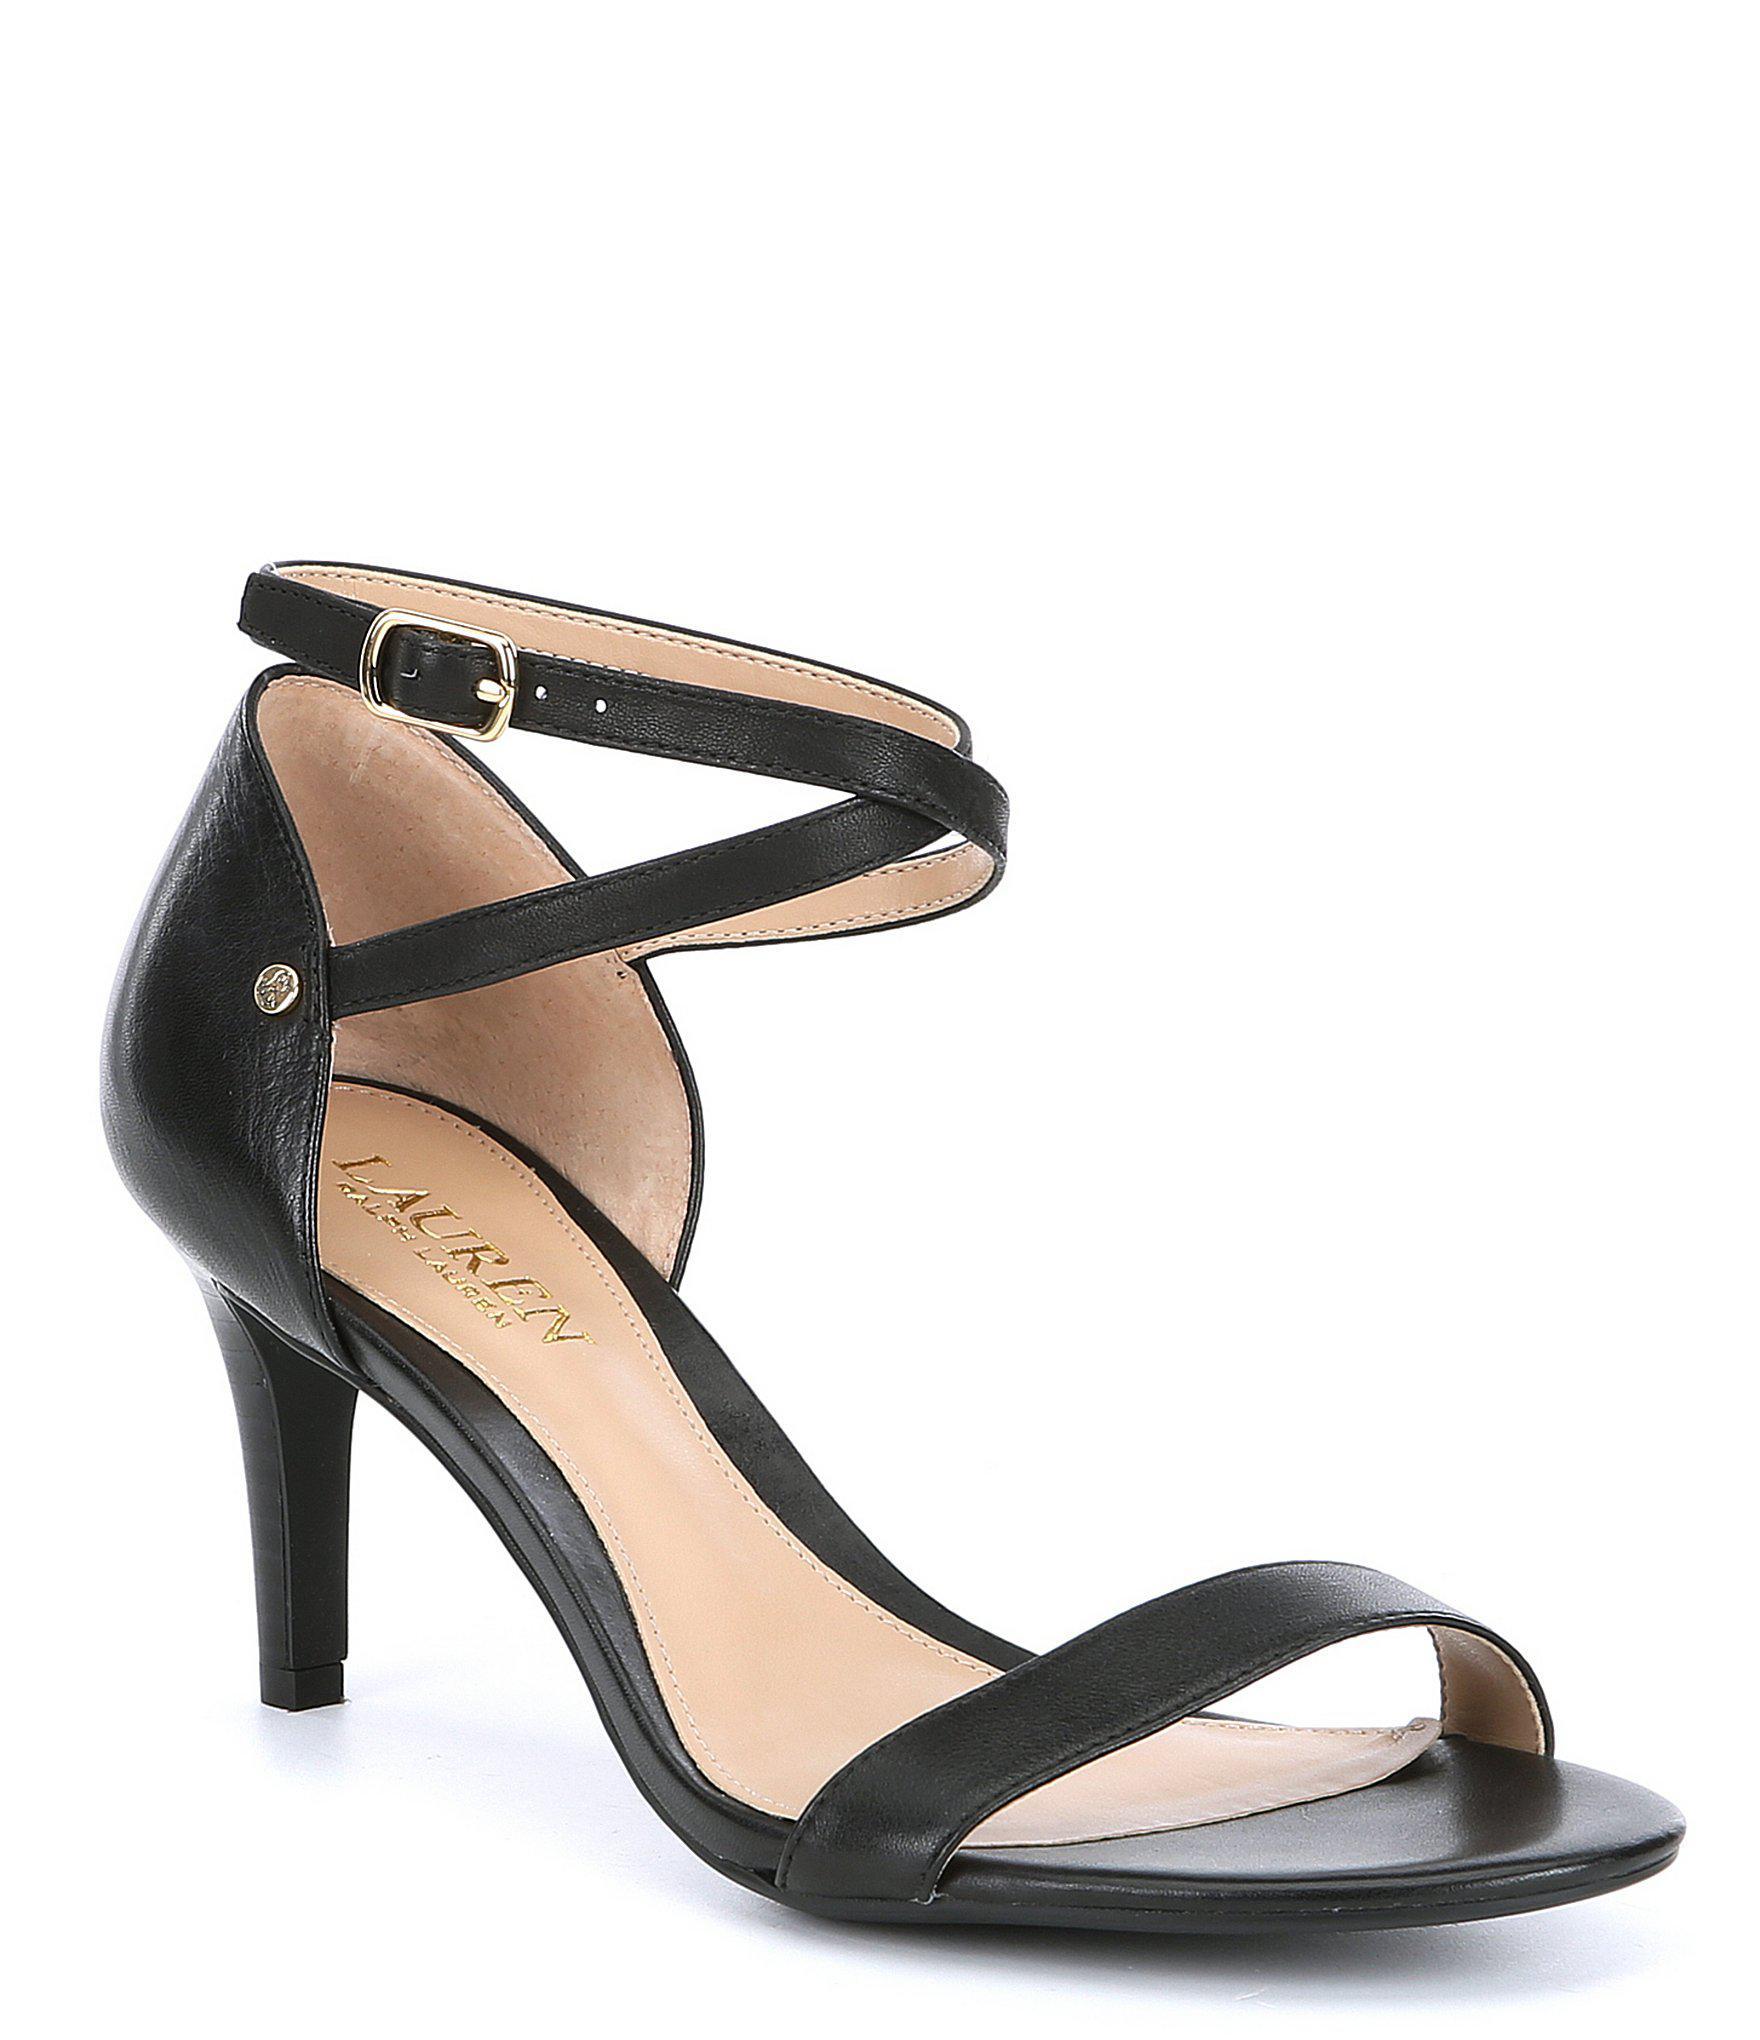 ef346d69ce1 Lauren by Ralph Lauren Black Glinda Leather Dress Sandals